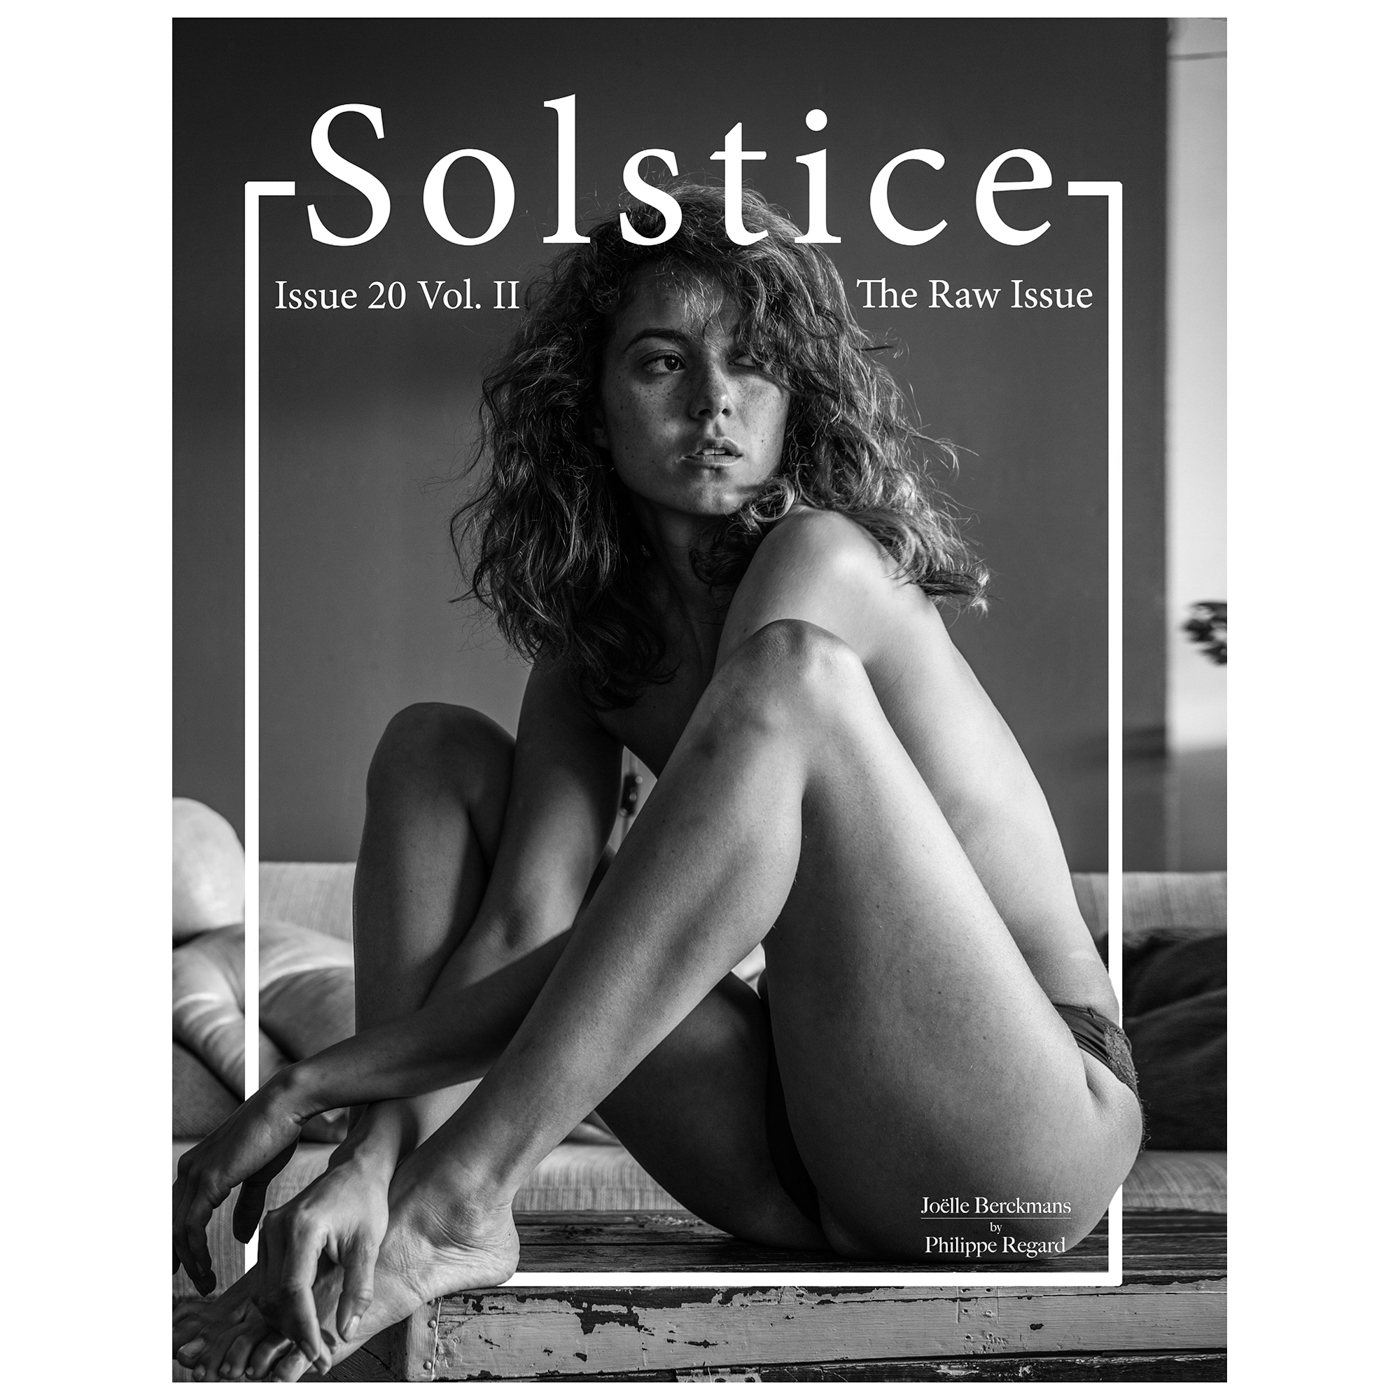 Solstice_Final-1000.jpg